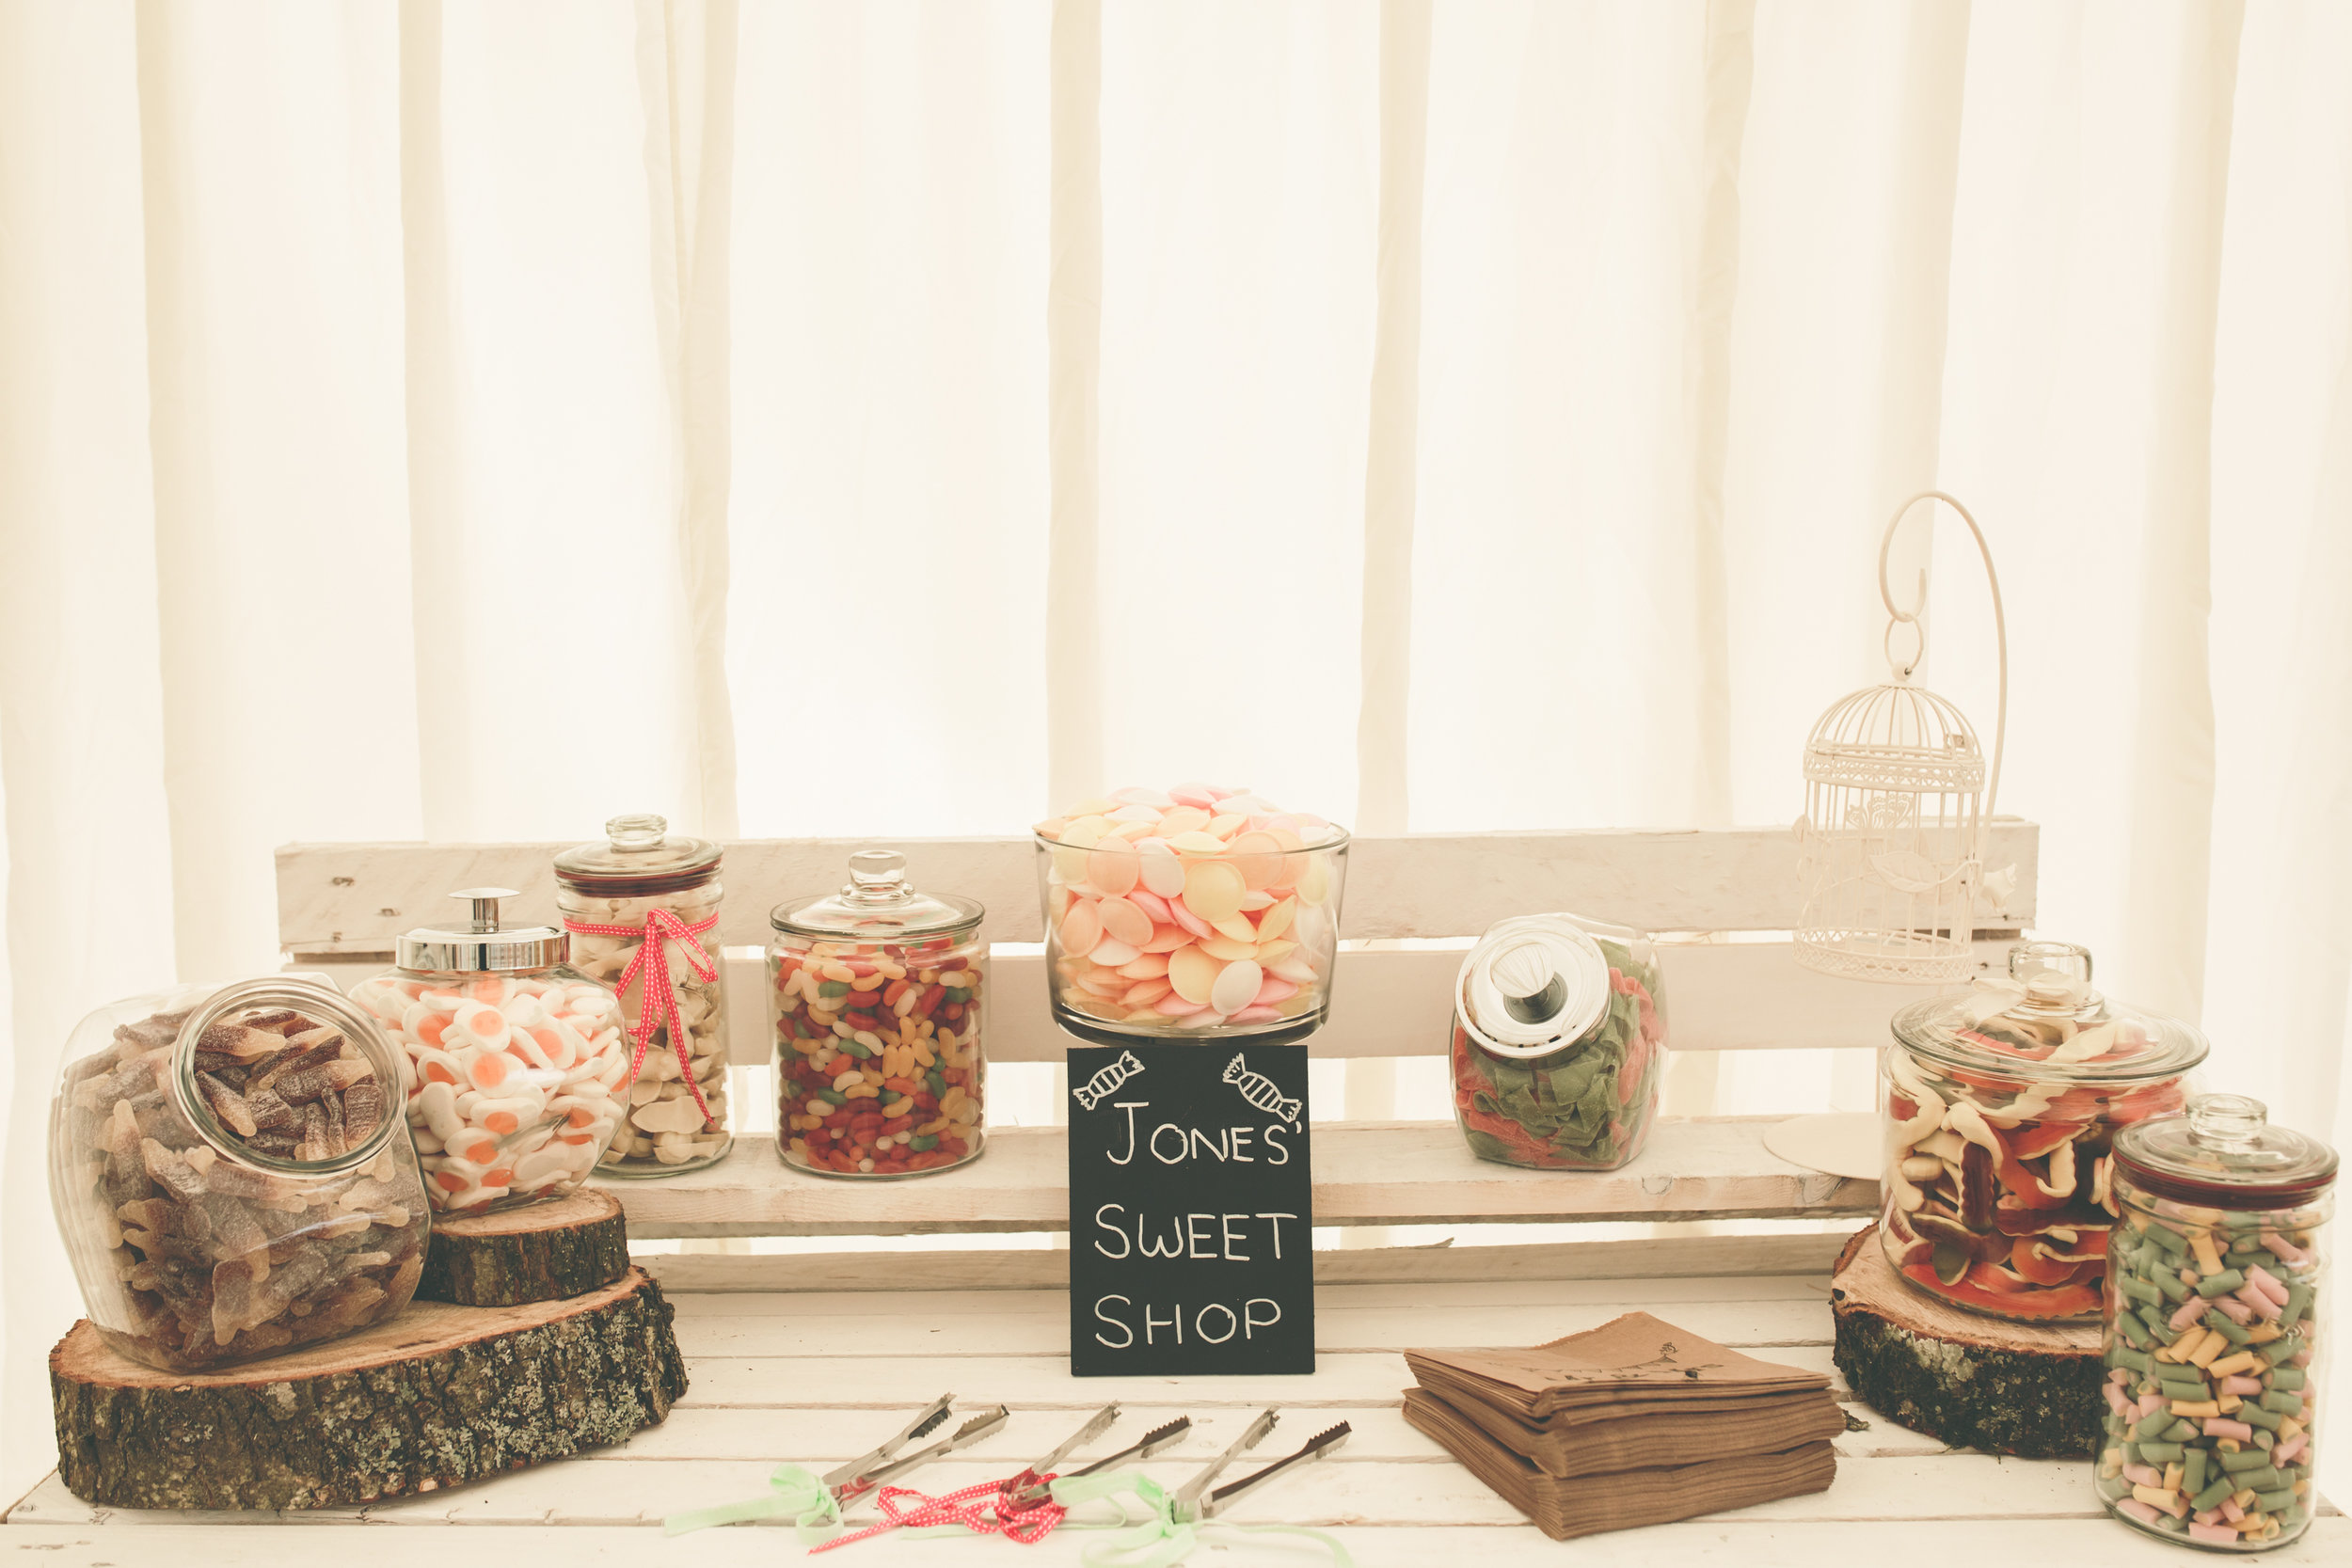 Sweet shop wedding styling, Shabby chic wedding